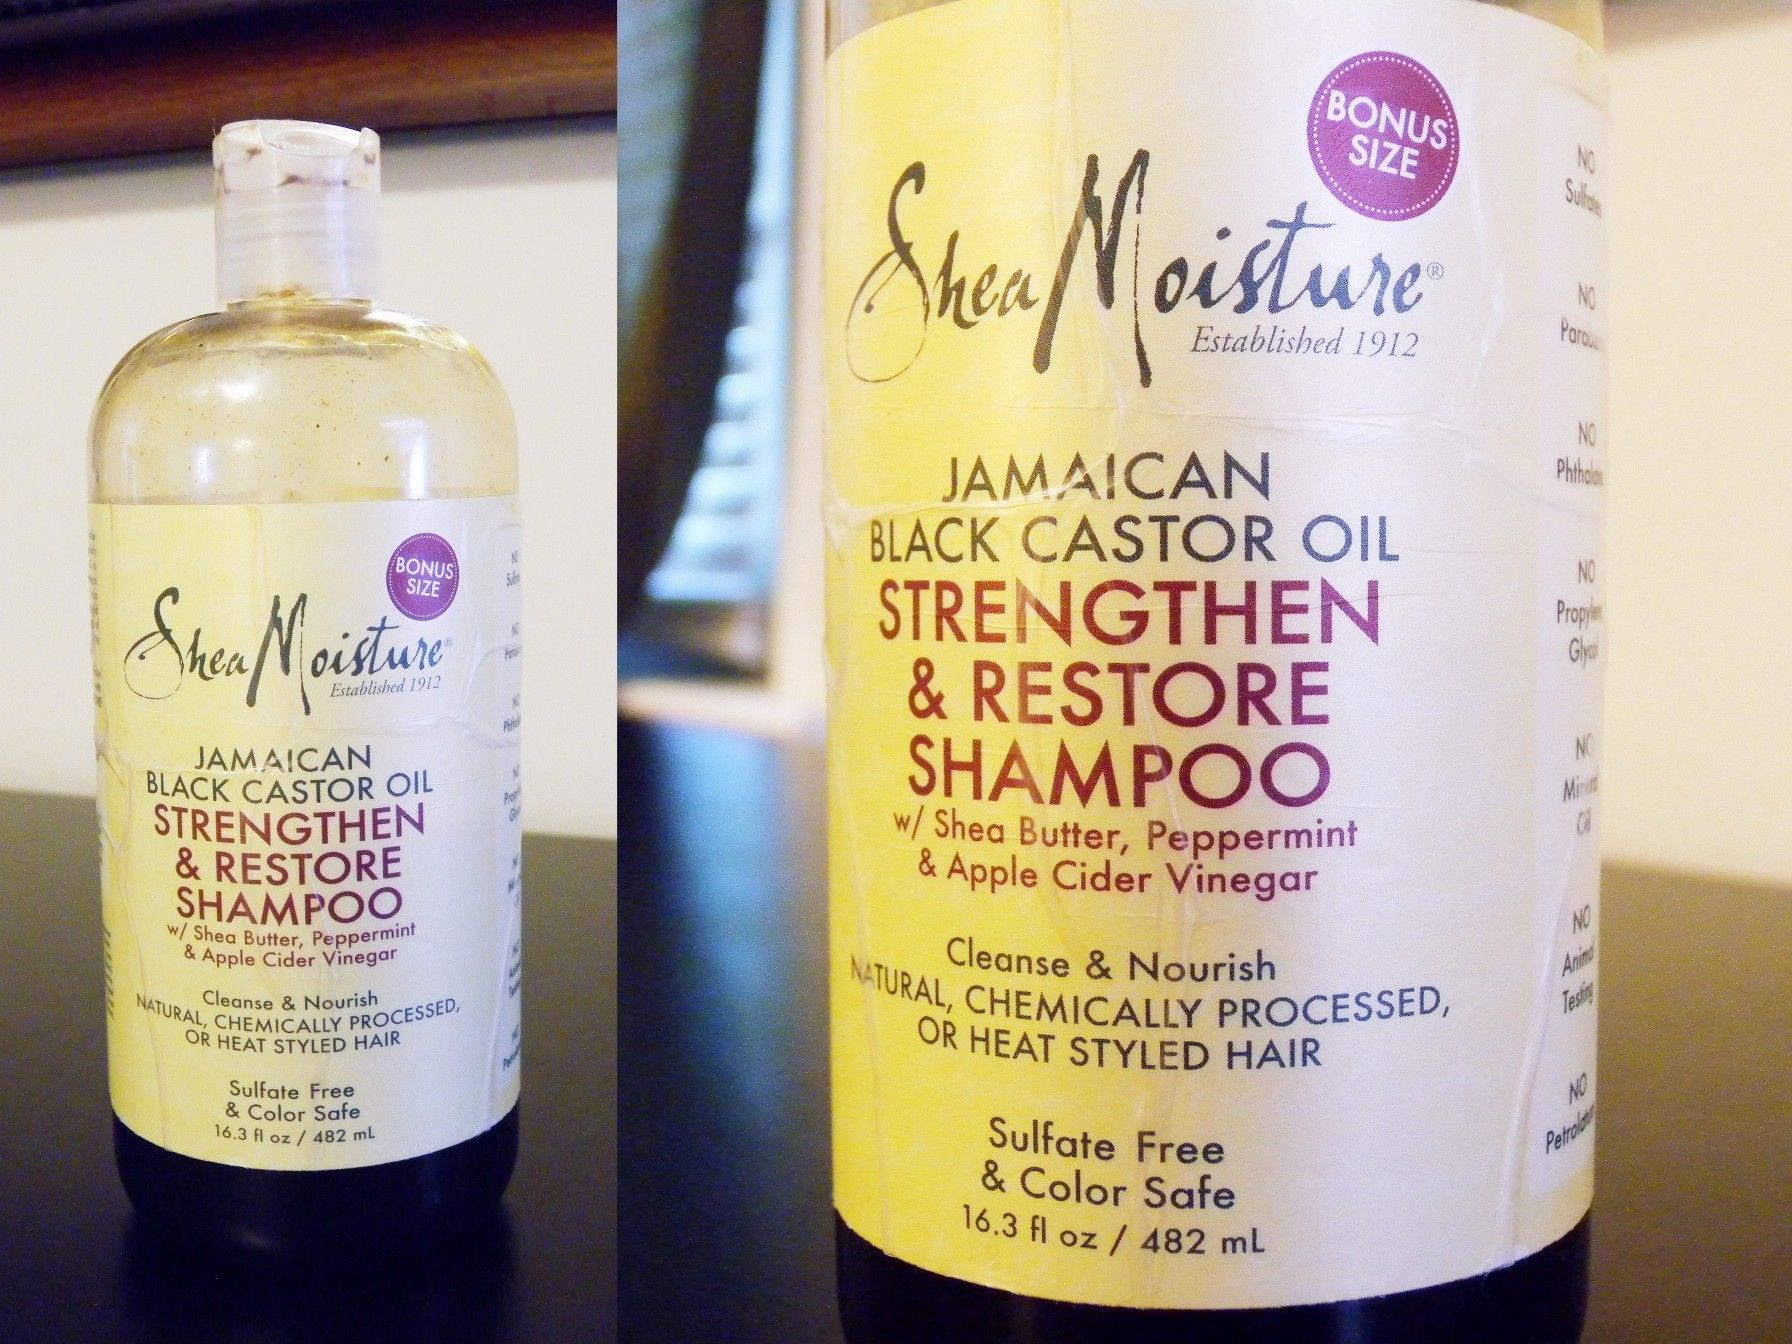 Shea Moisture Jamaican Black Castor Oil Strengthen Restore Shampoo Great Restor Shea Moisture Products Castor Oil Shampoo Apple Cider Vinegar Shampoo